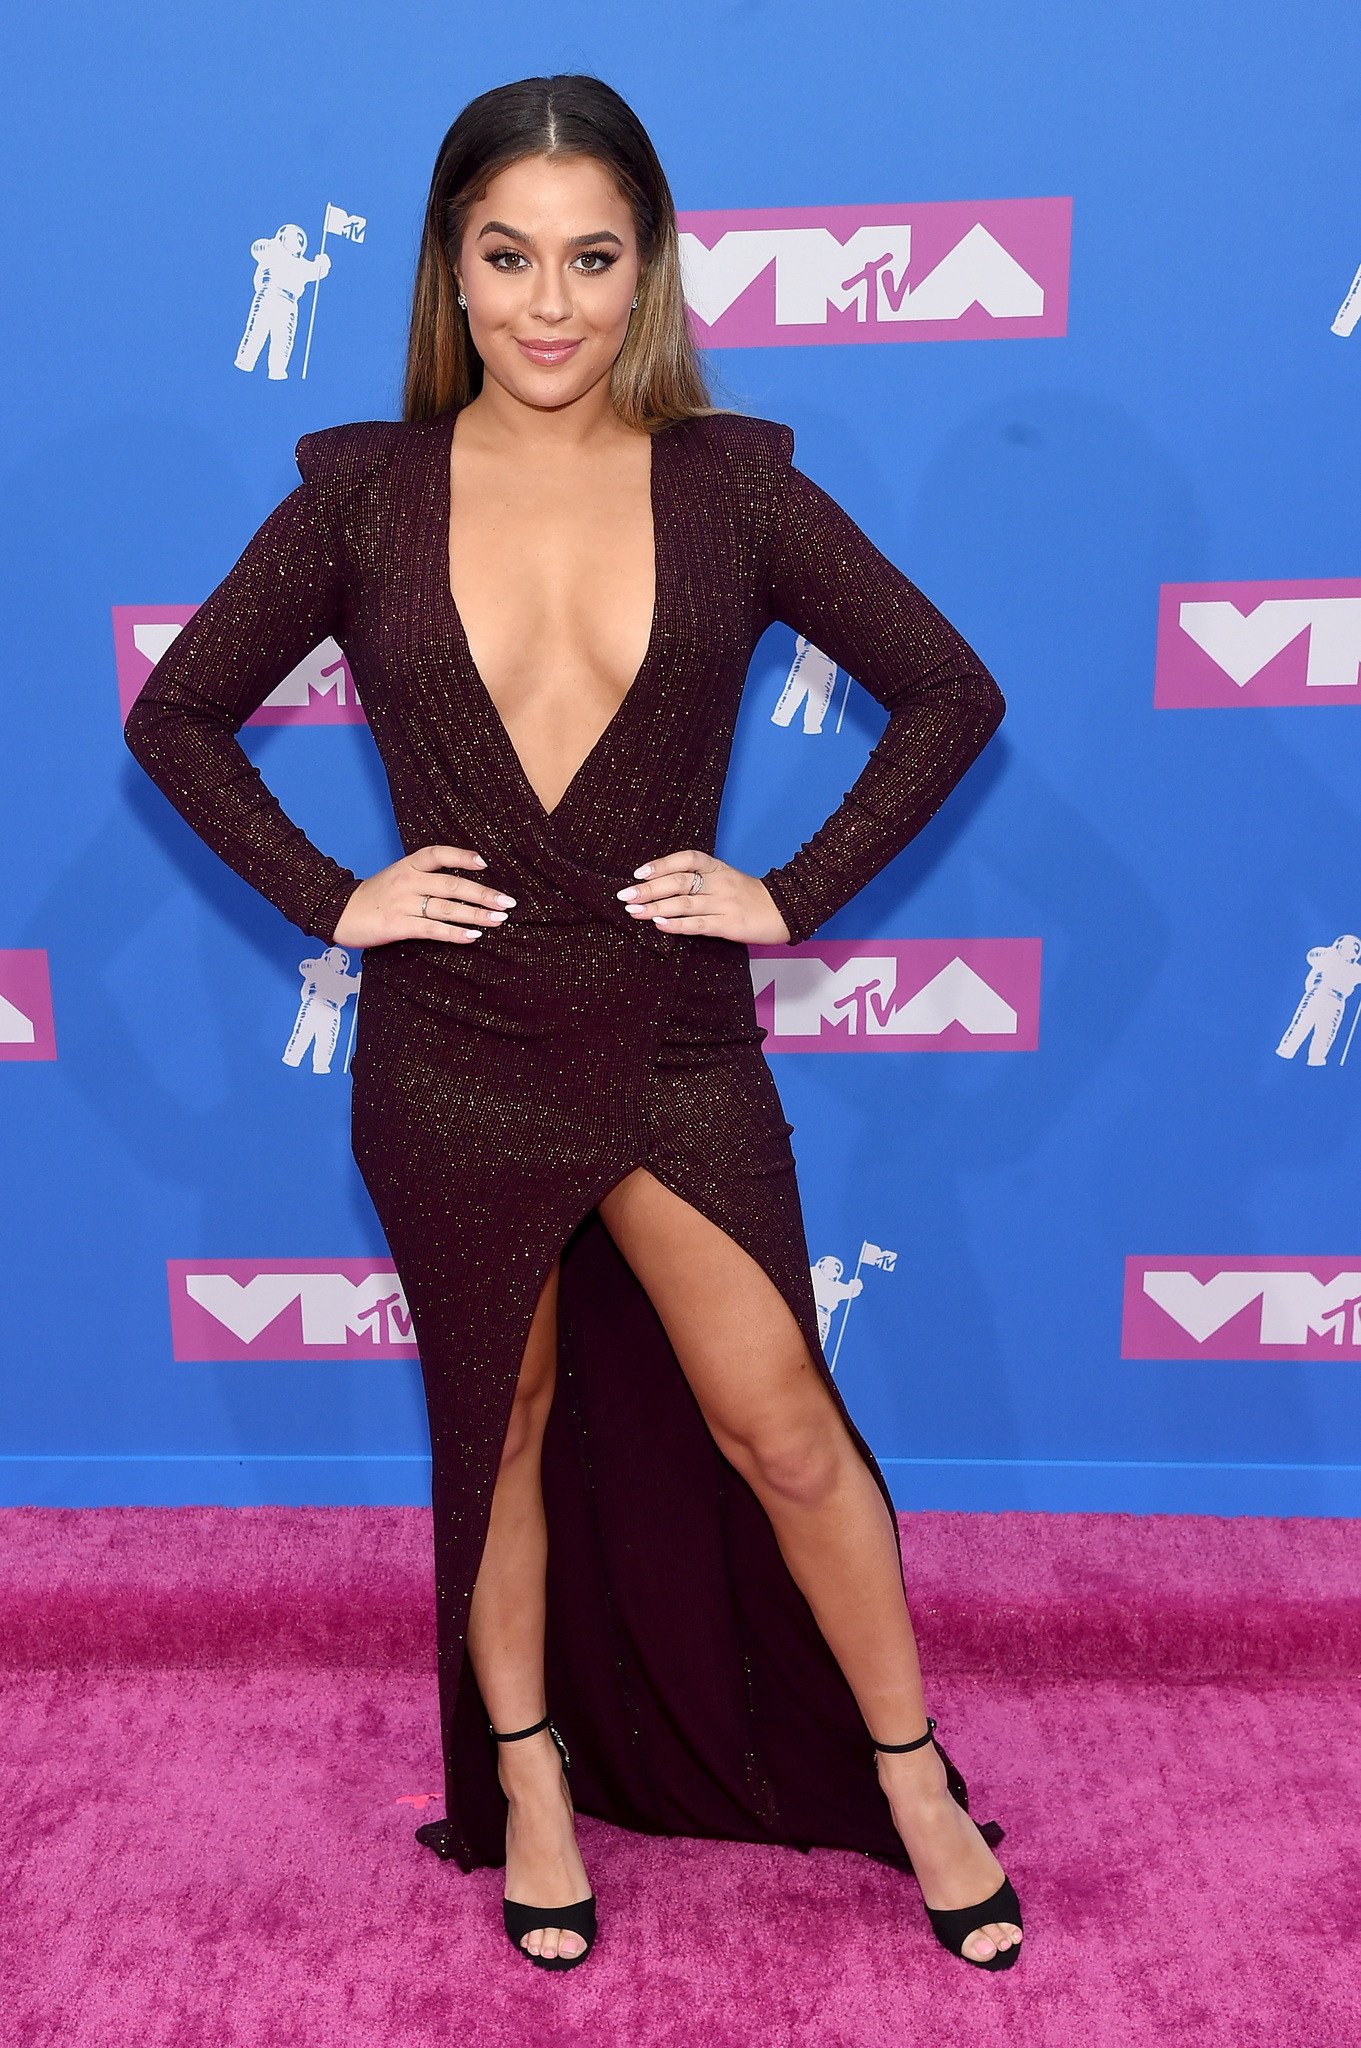 Tessa Brooks nudes (92 photo), video Porno, YouTube, butt 2019